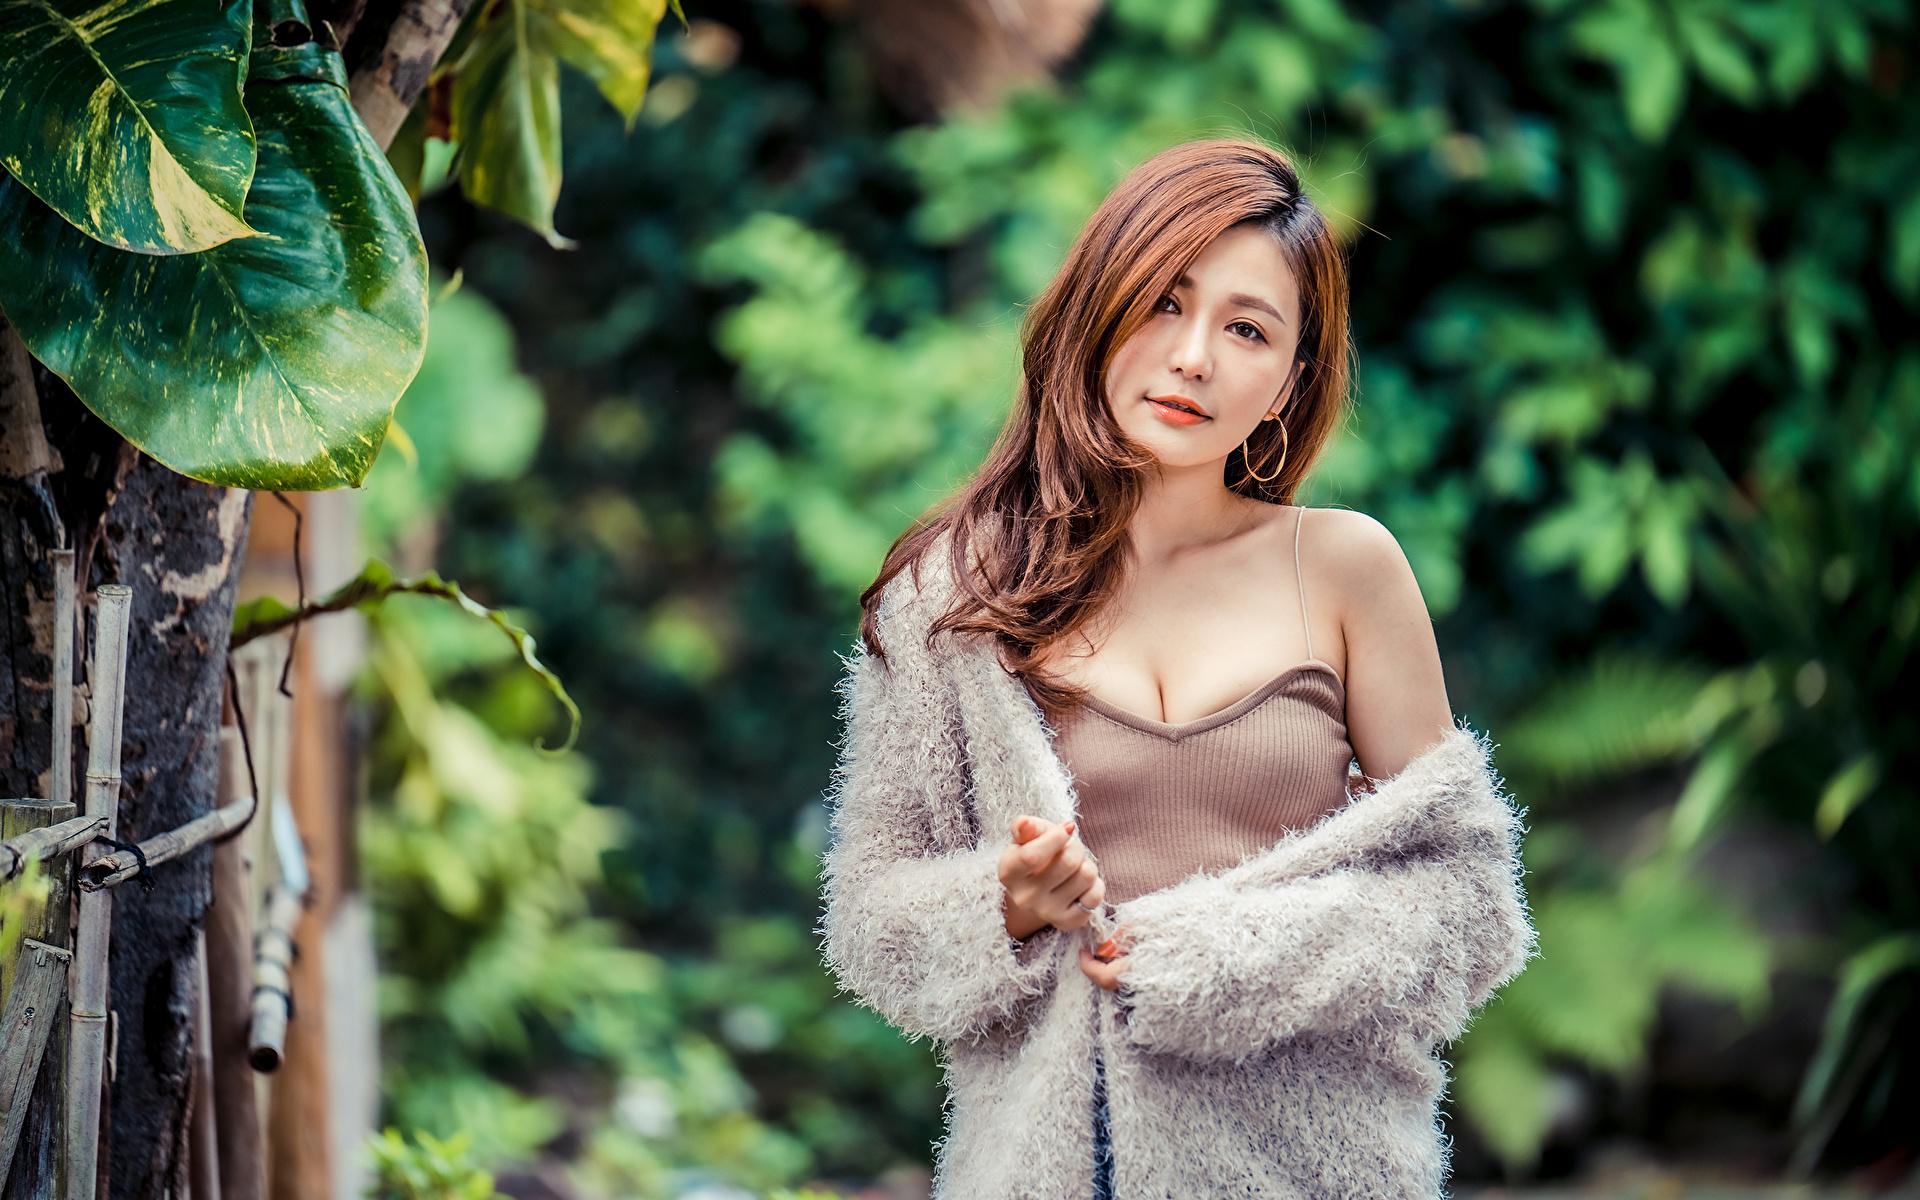 Fotos Braune Haare junge frau Asiaten Blick 1920x1200 Braunhaarige Mädchens junge Frauen Asiatische asiatisches Starren